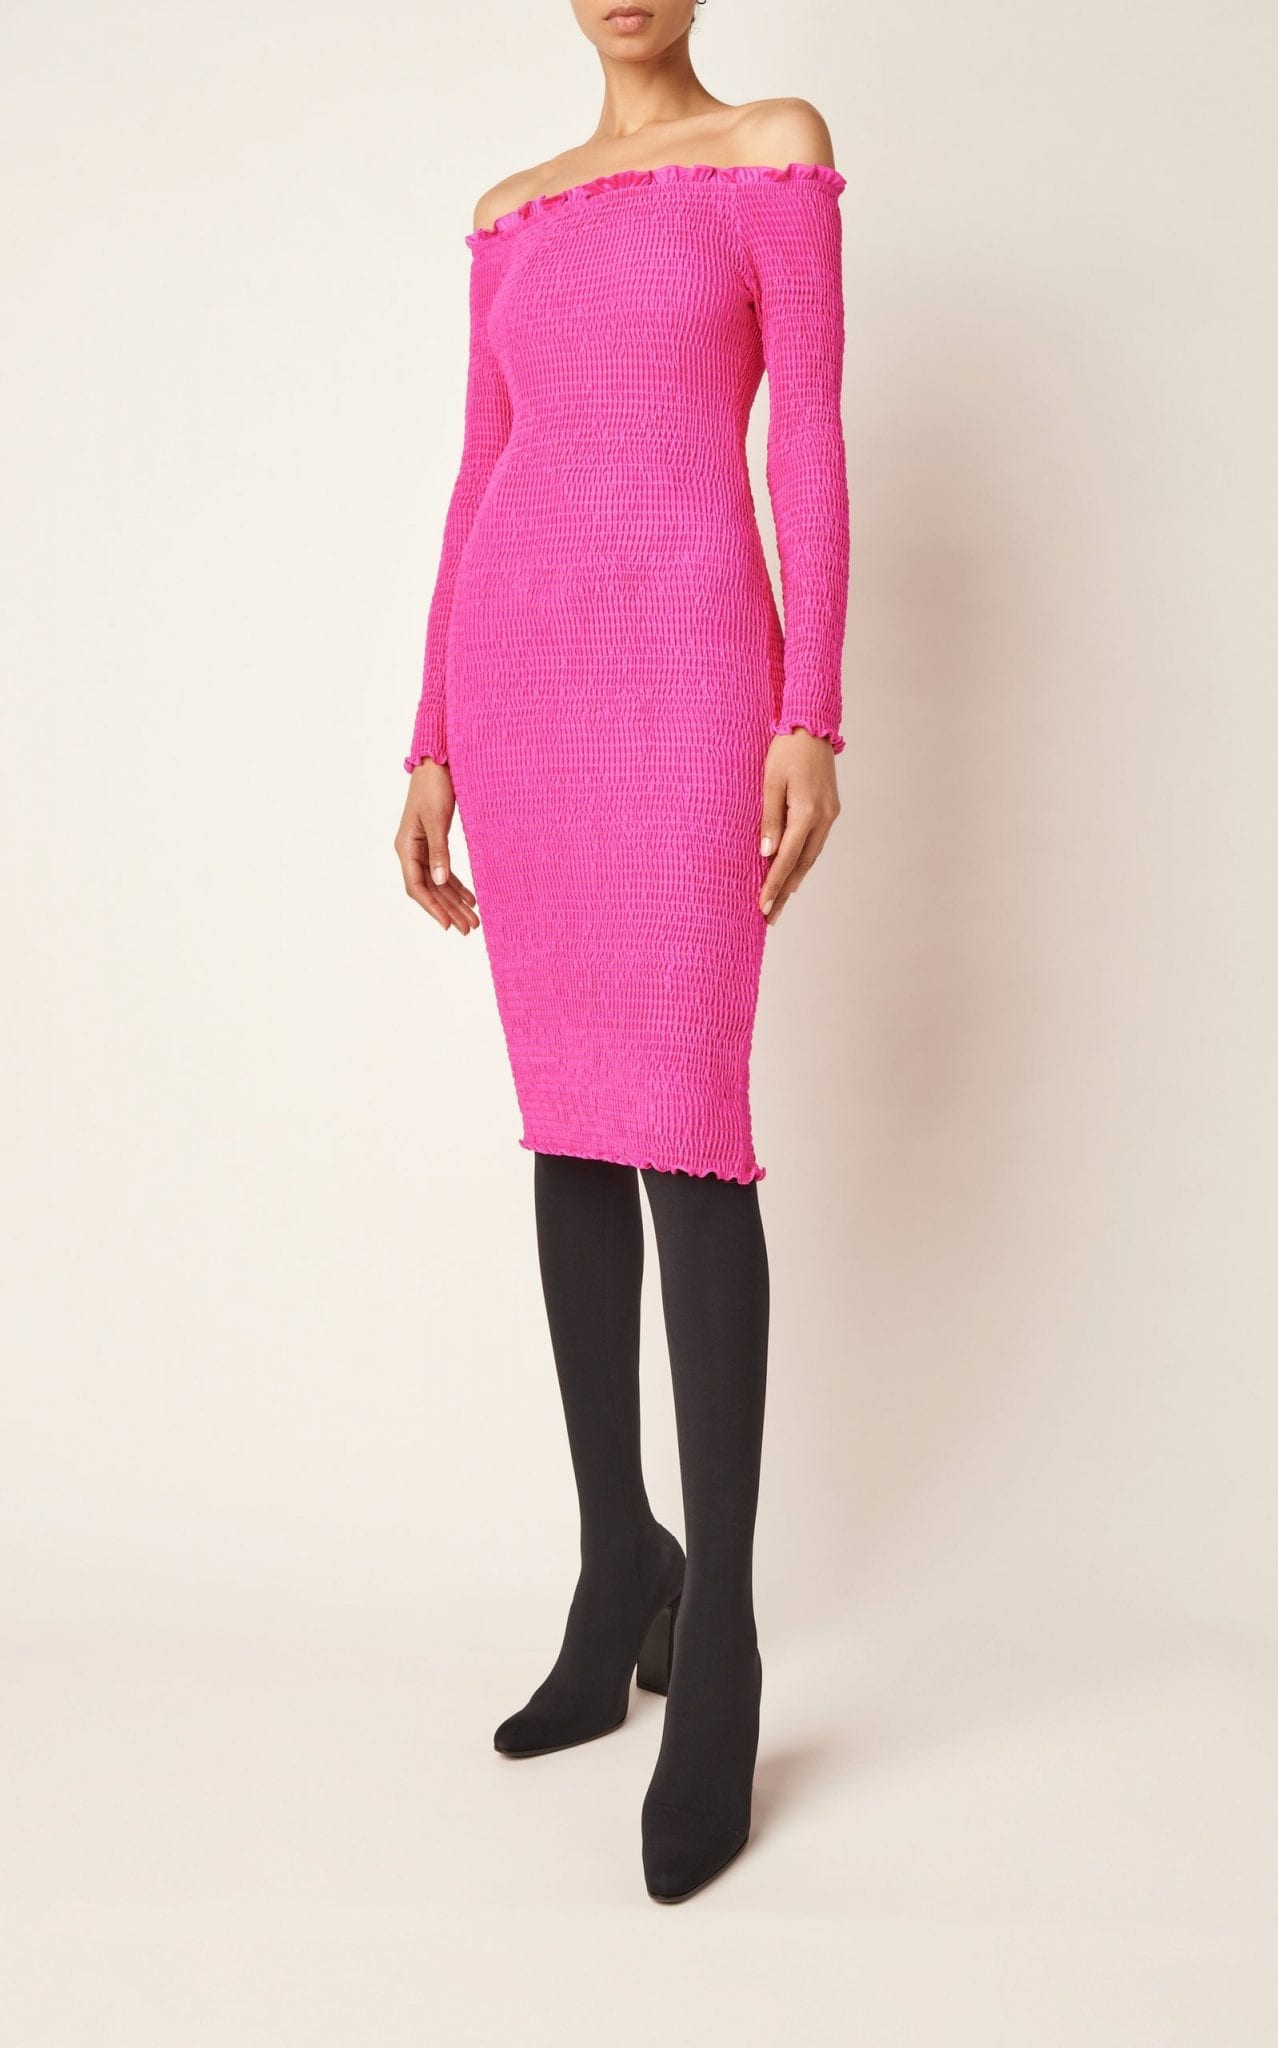 BALENCIAGA Smocked Jersey Dress